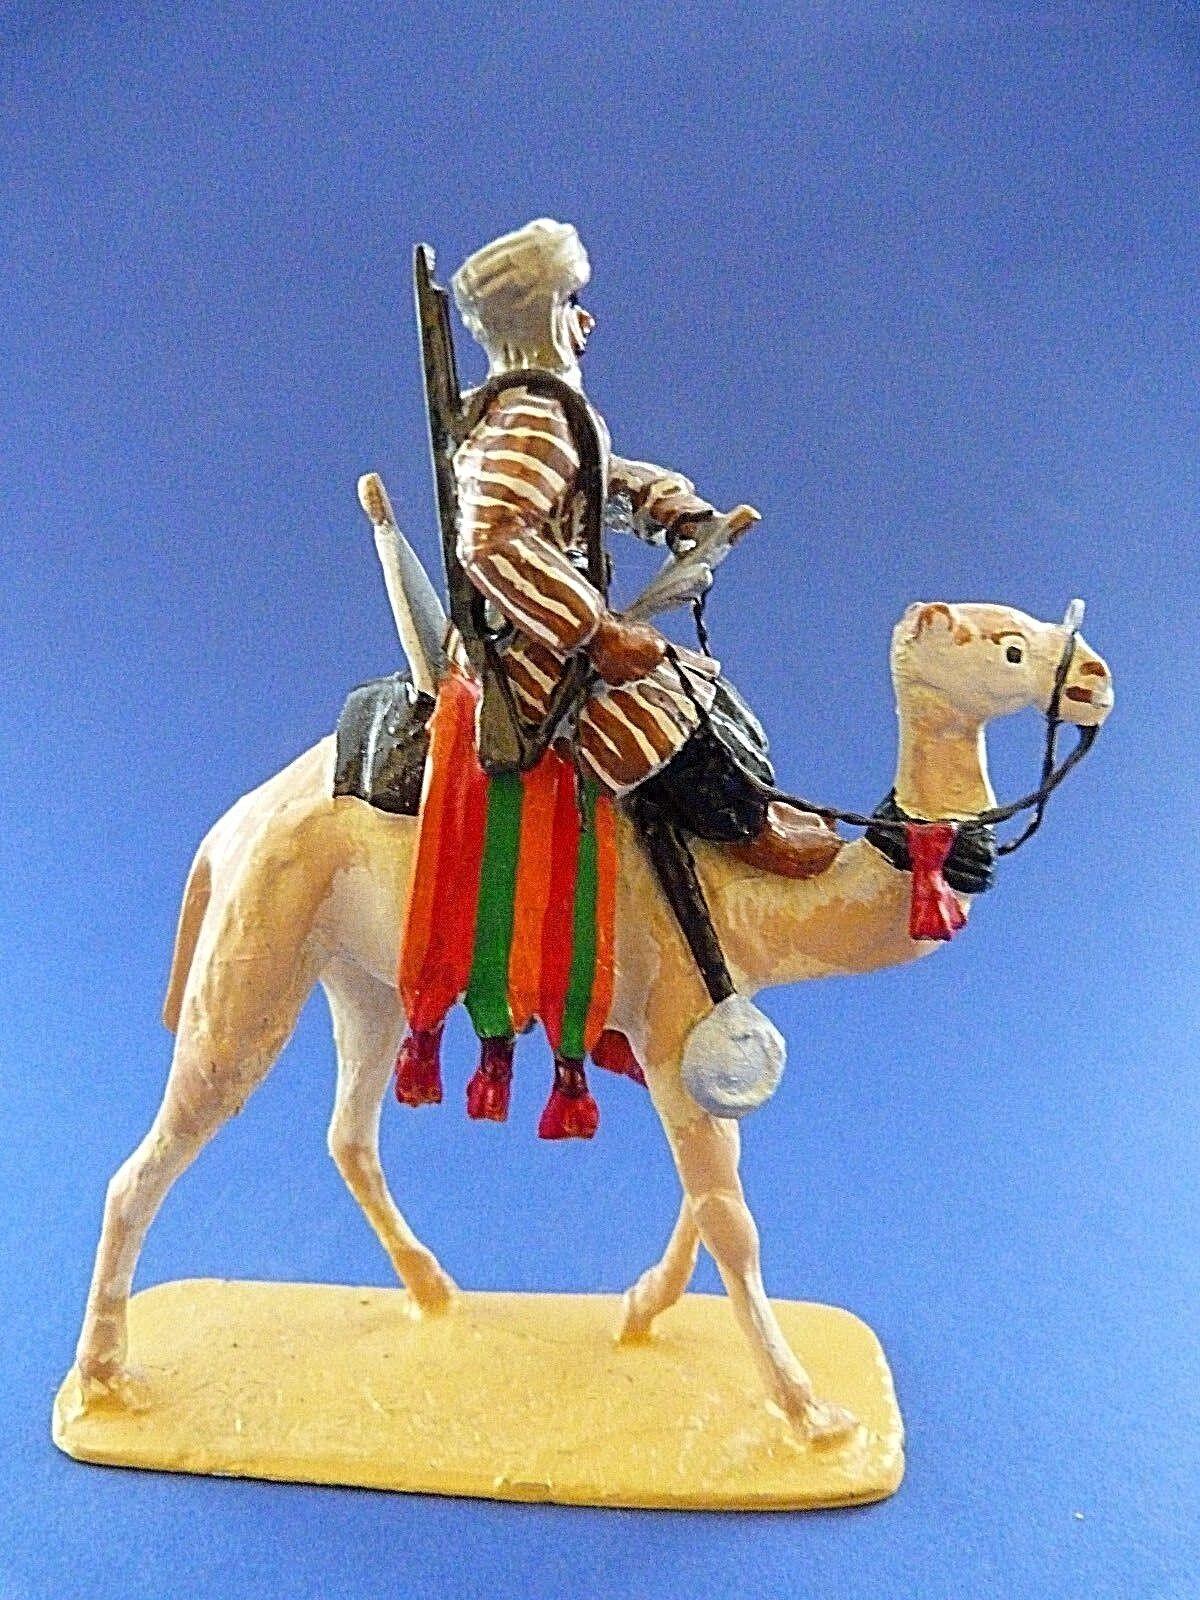 Soldaten - franzosen kamel - führen - arm é e fran ç aise des conqu ê tes coloniales - 2